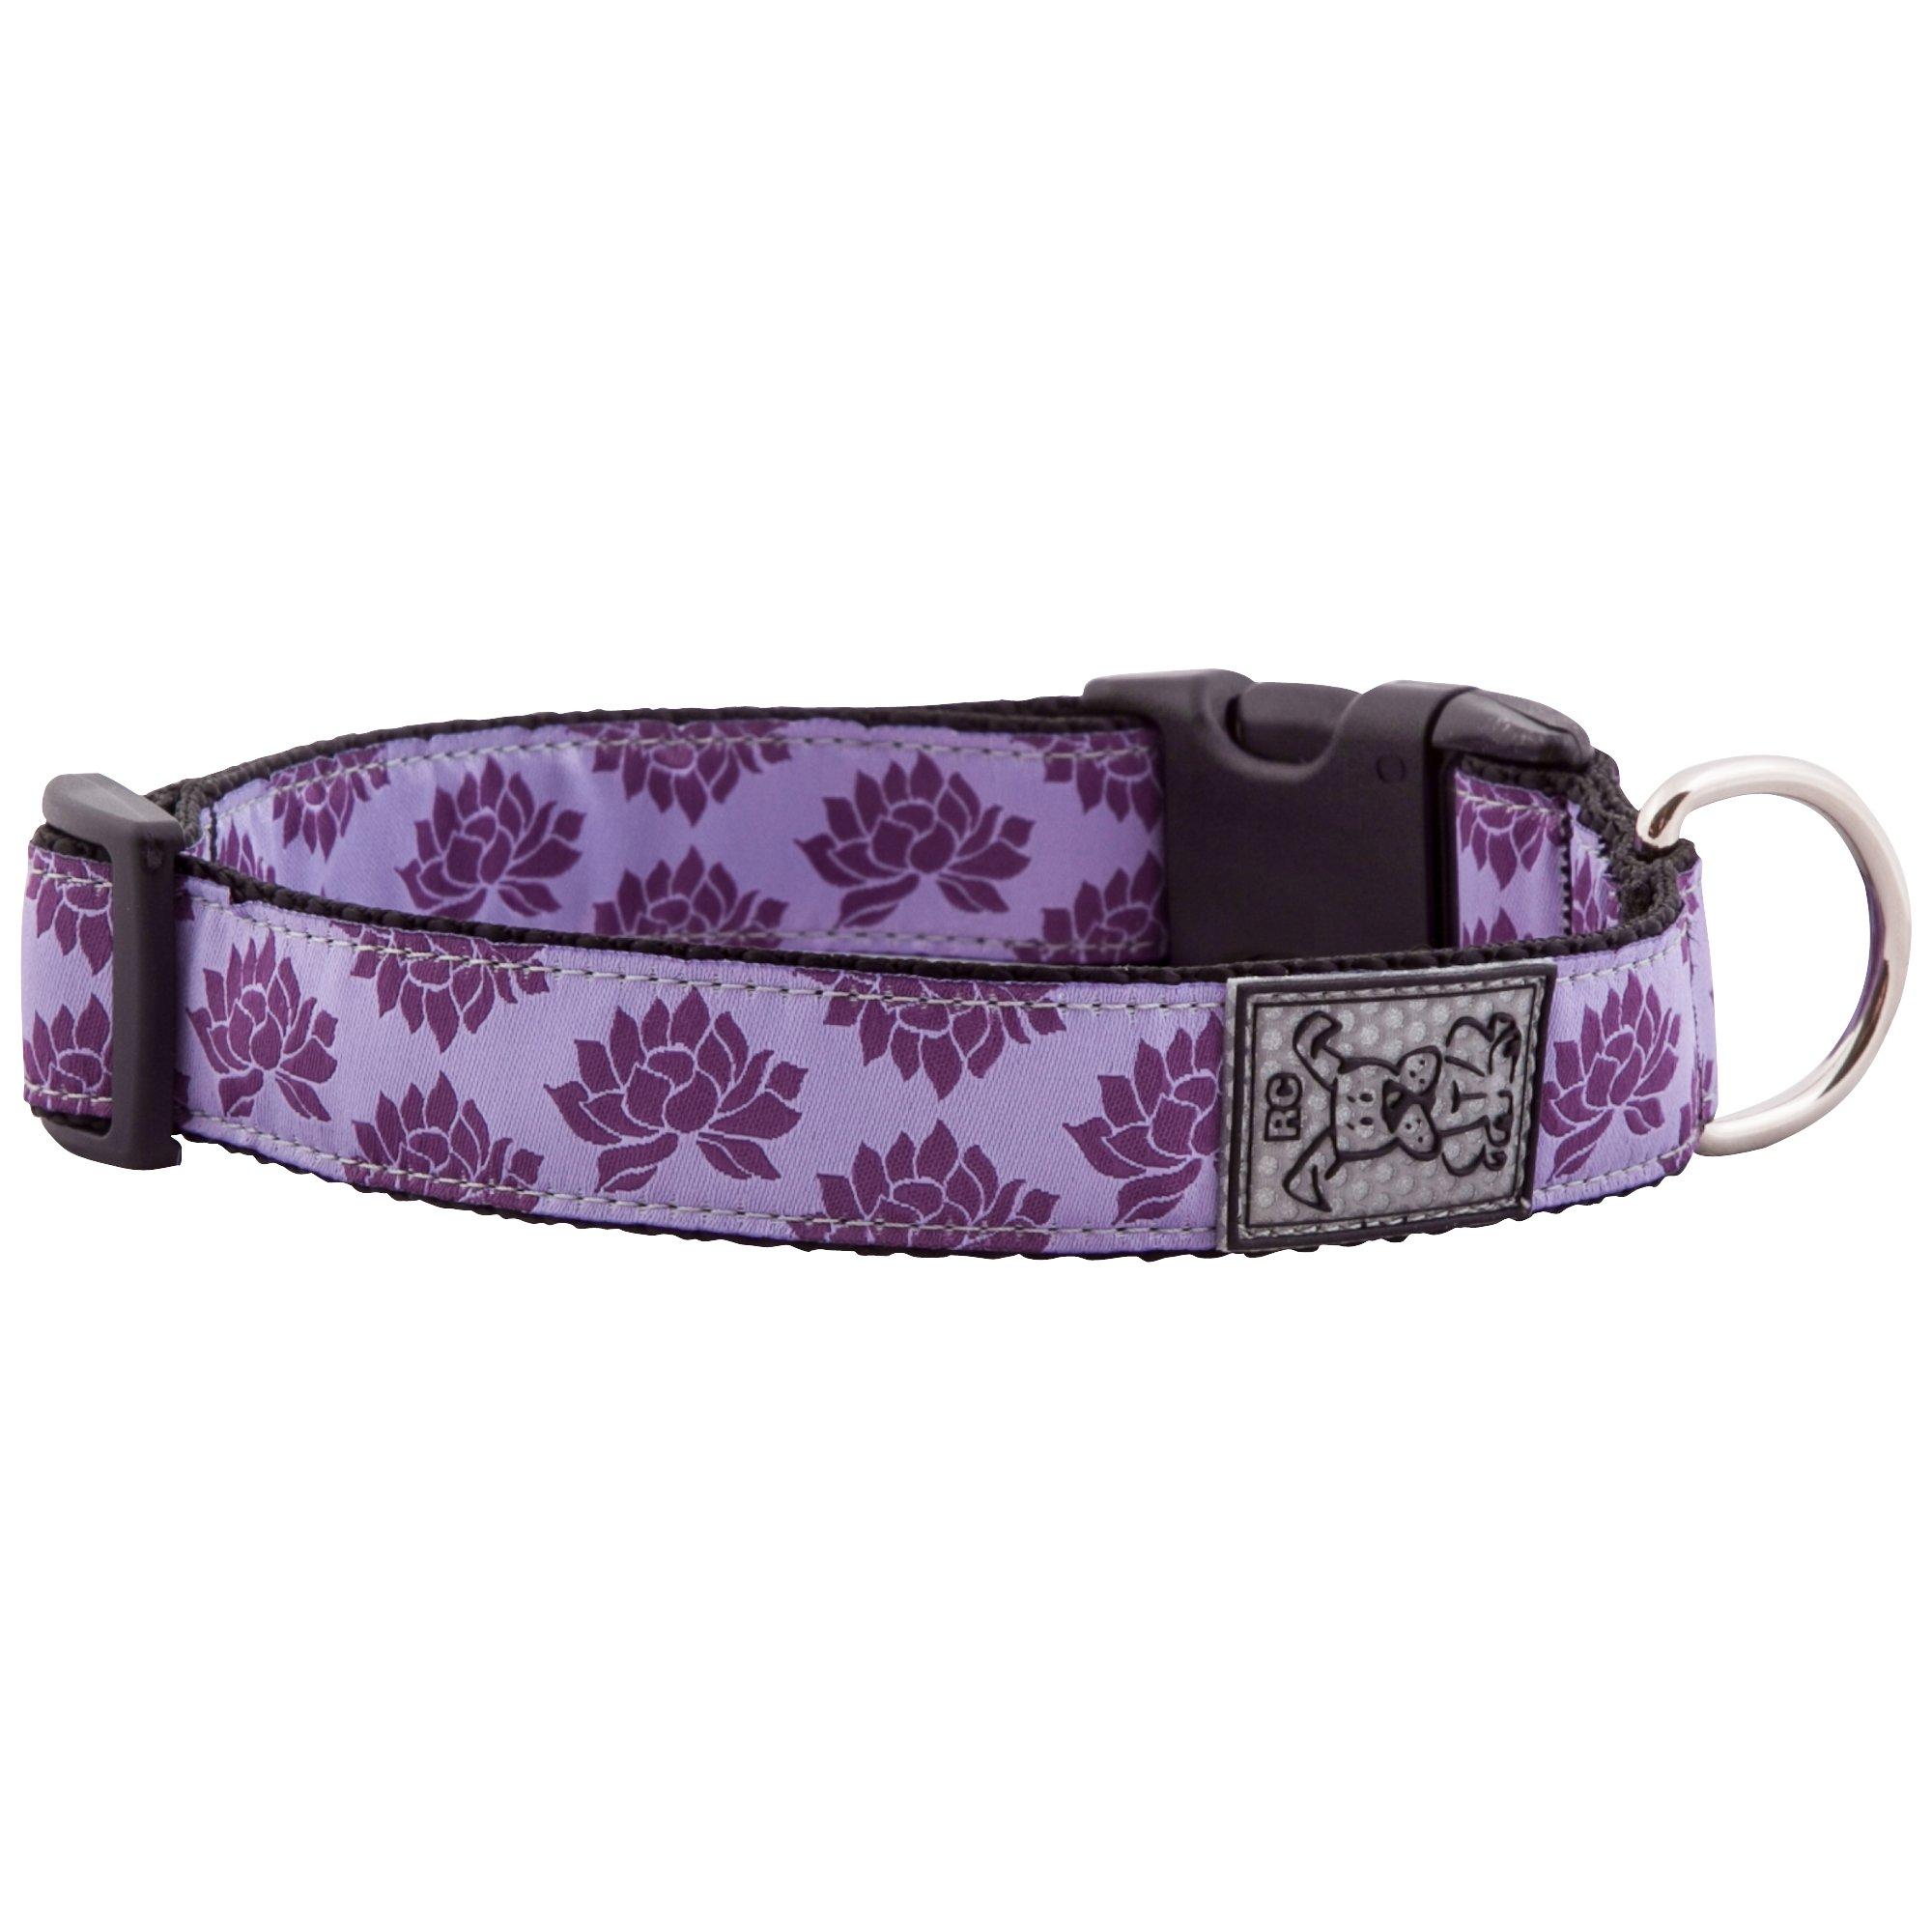 RC Pet Products Nirvana Dog Collar